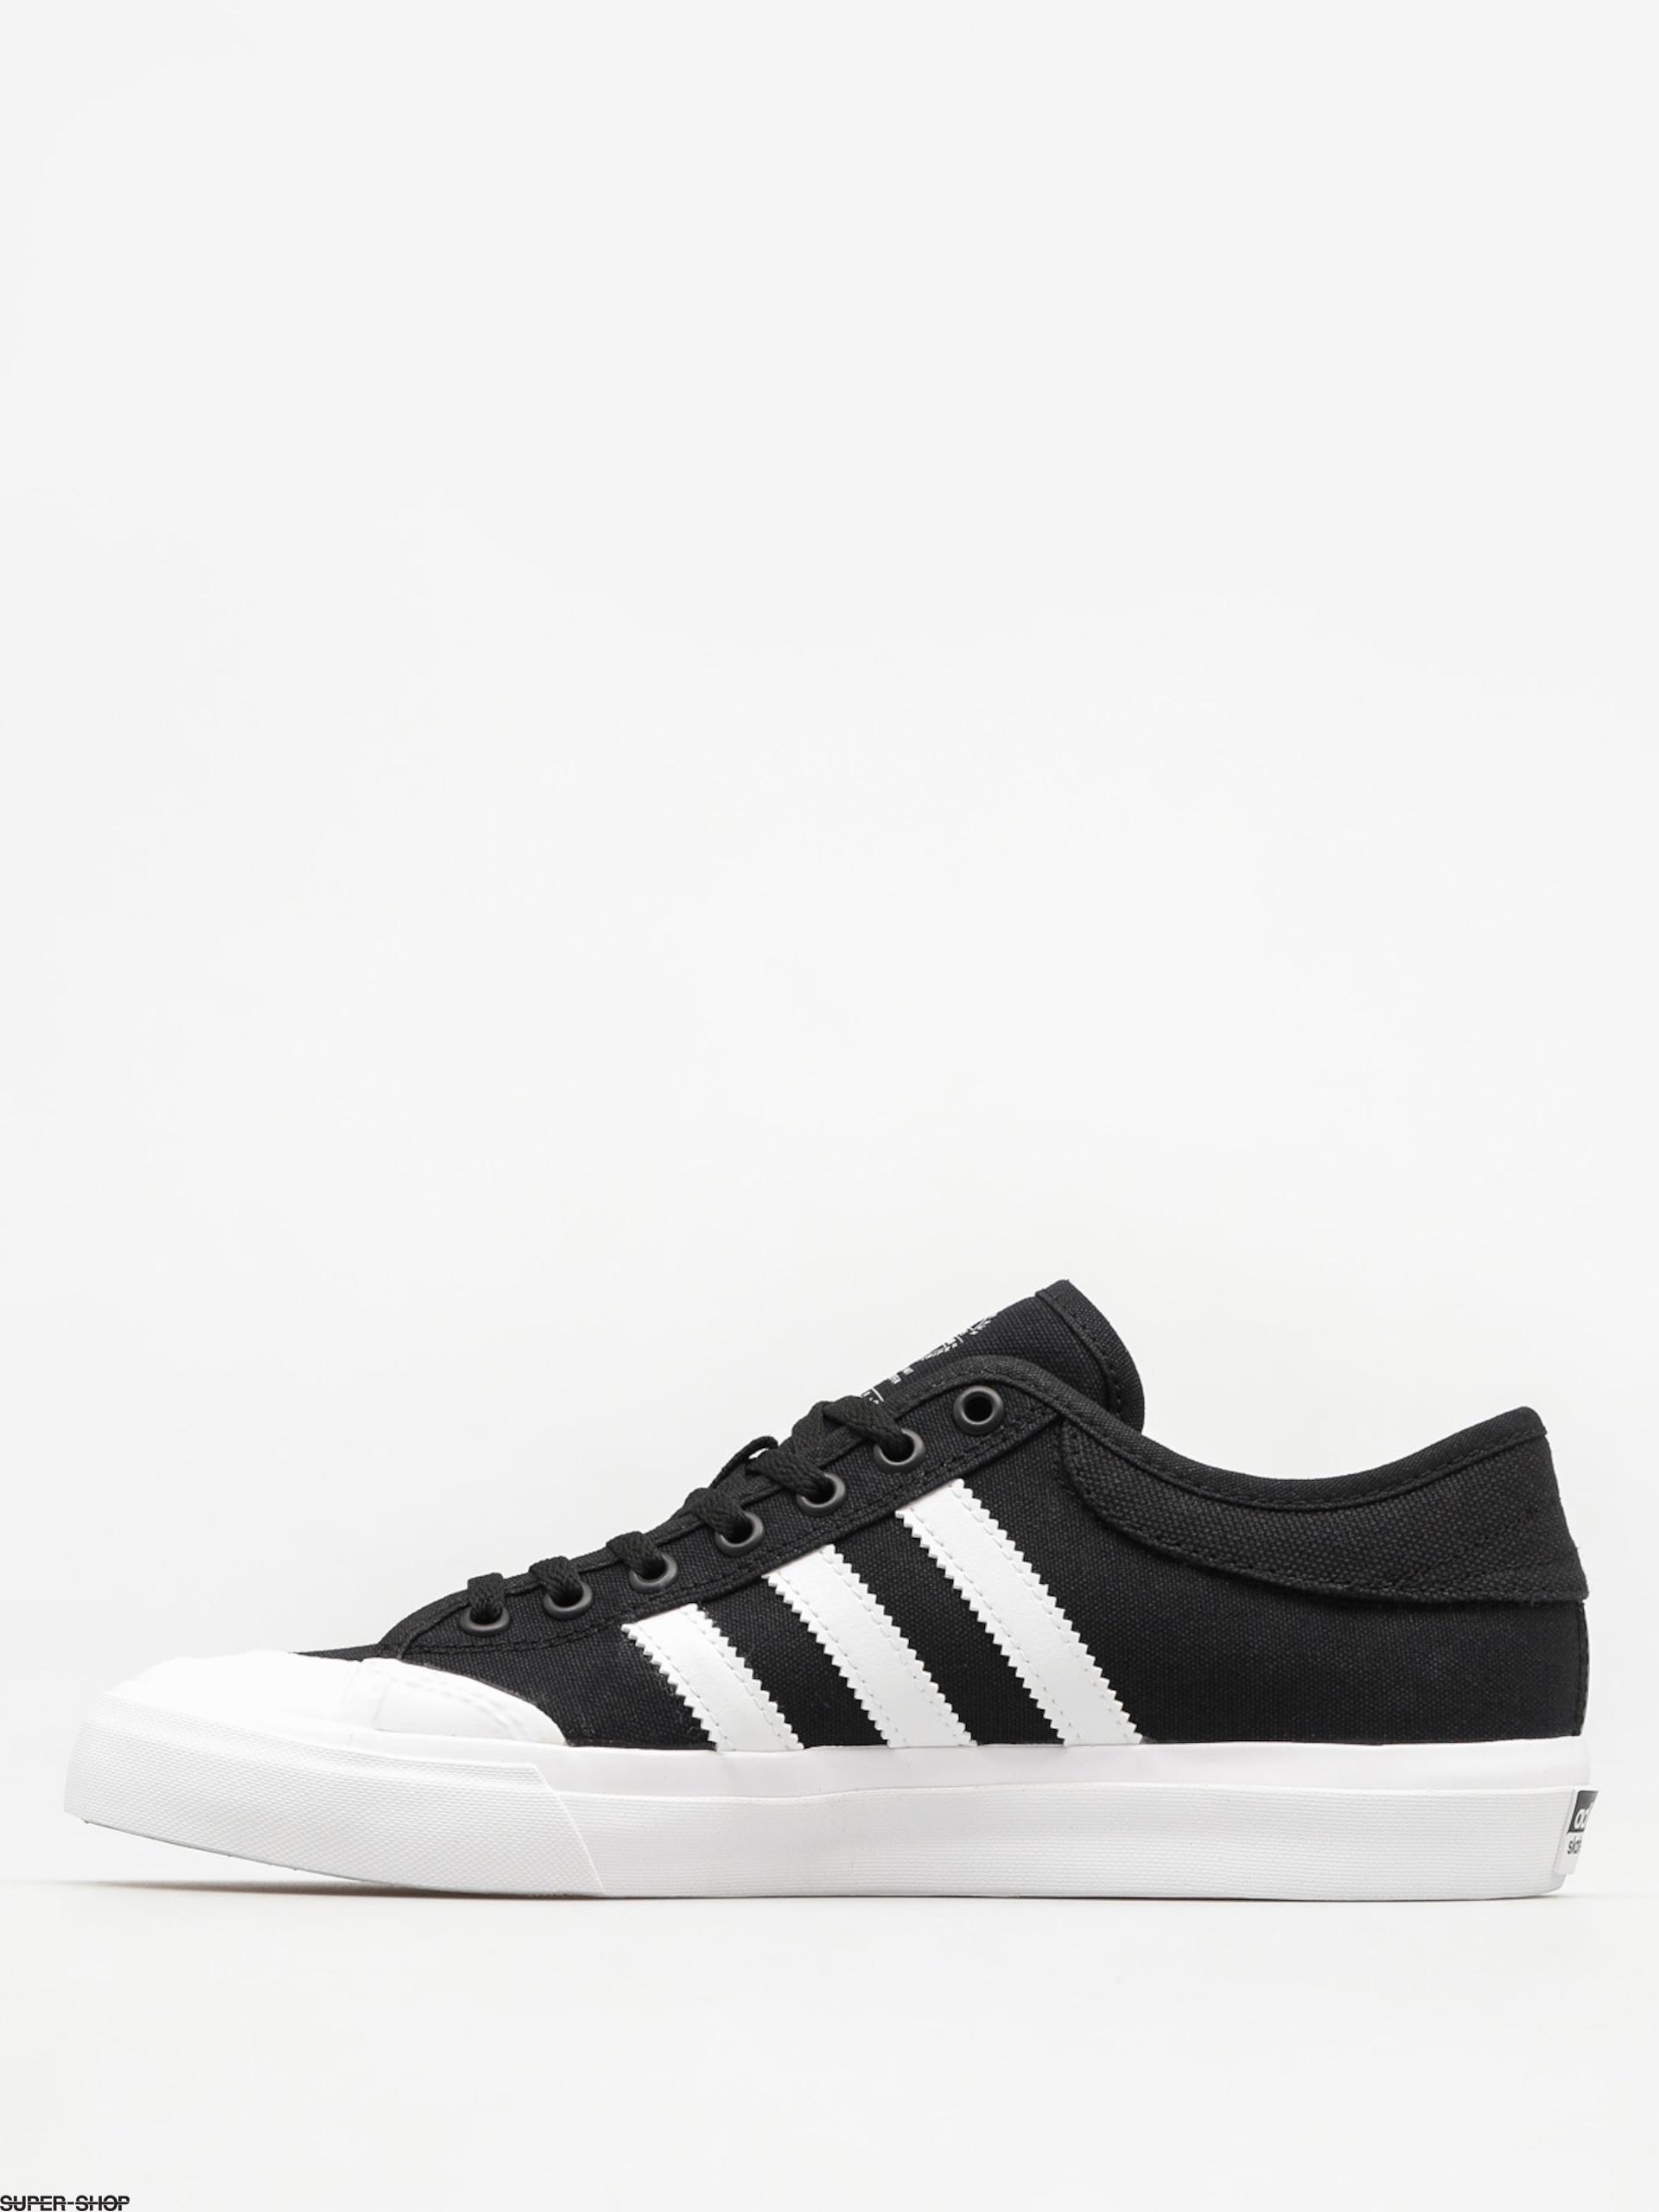 18f258f8da7a adidas Shoes Matchcourt (core black ftwr white core black)